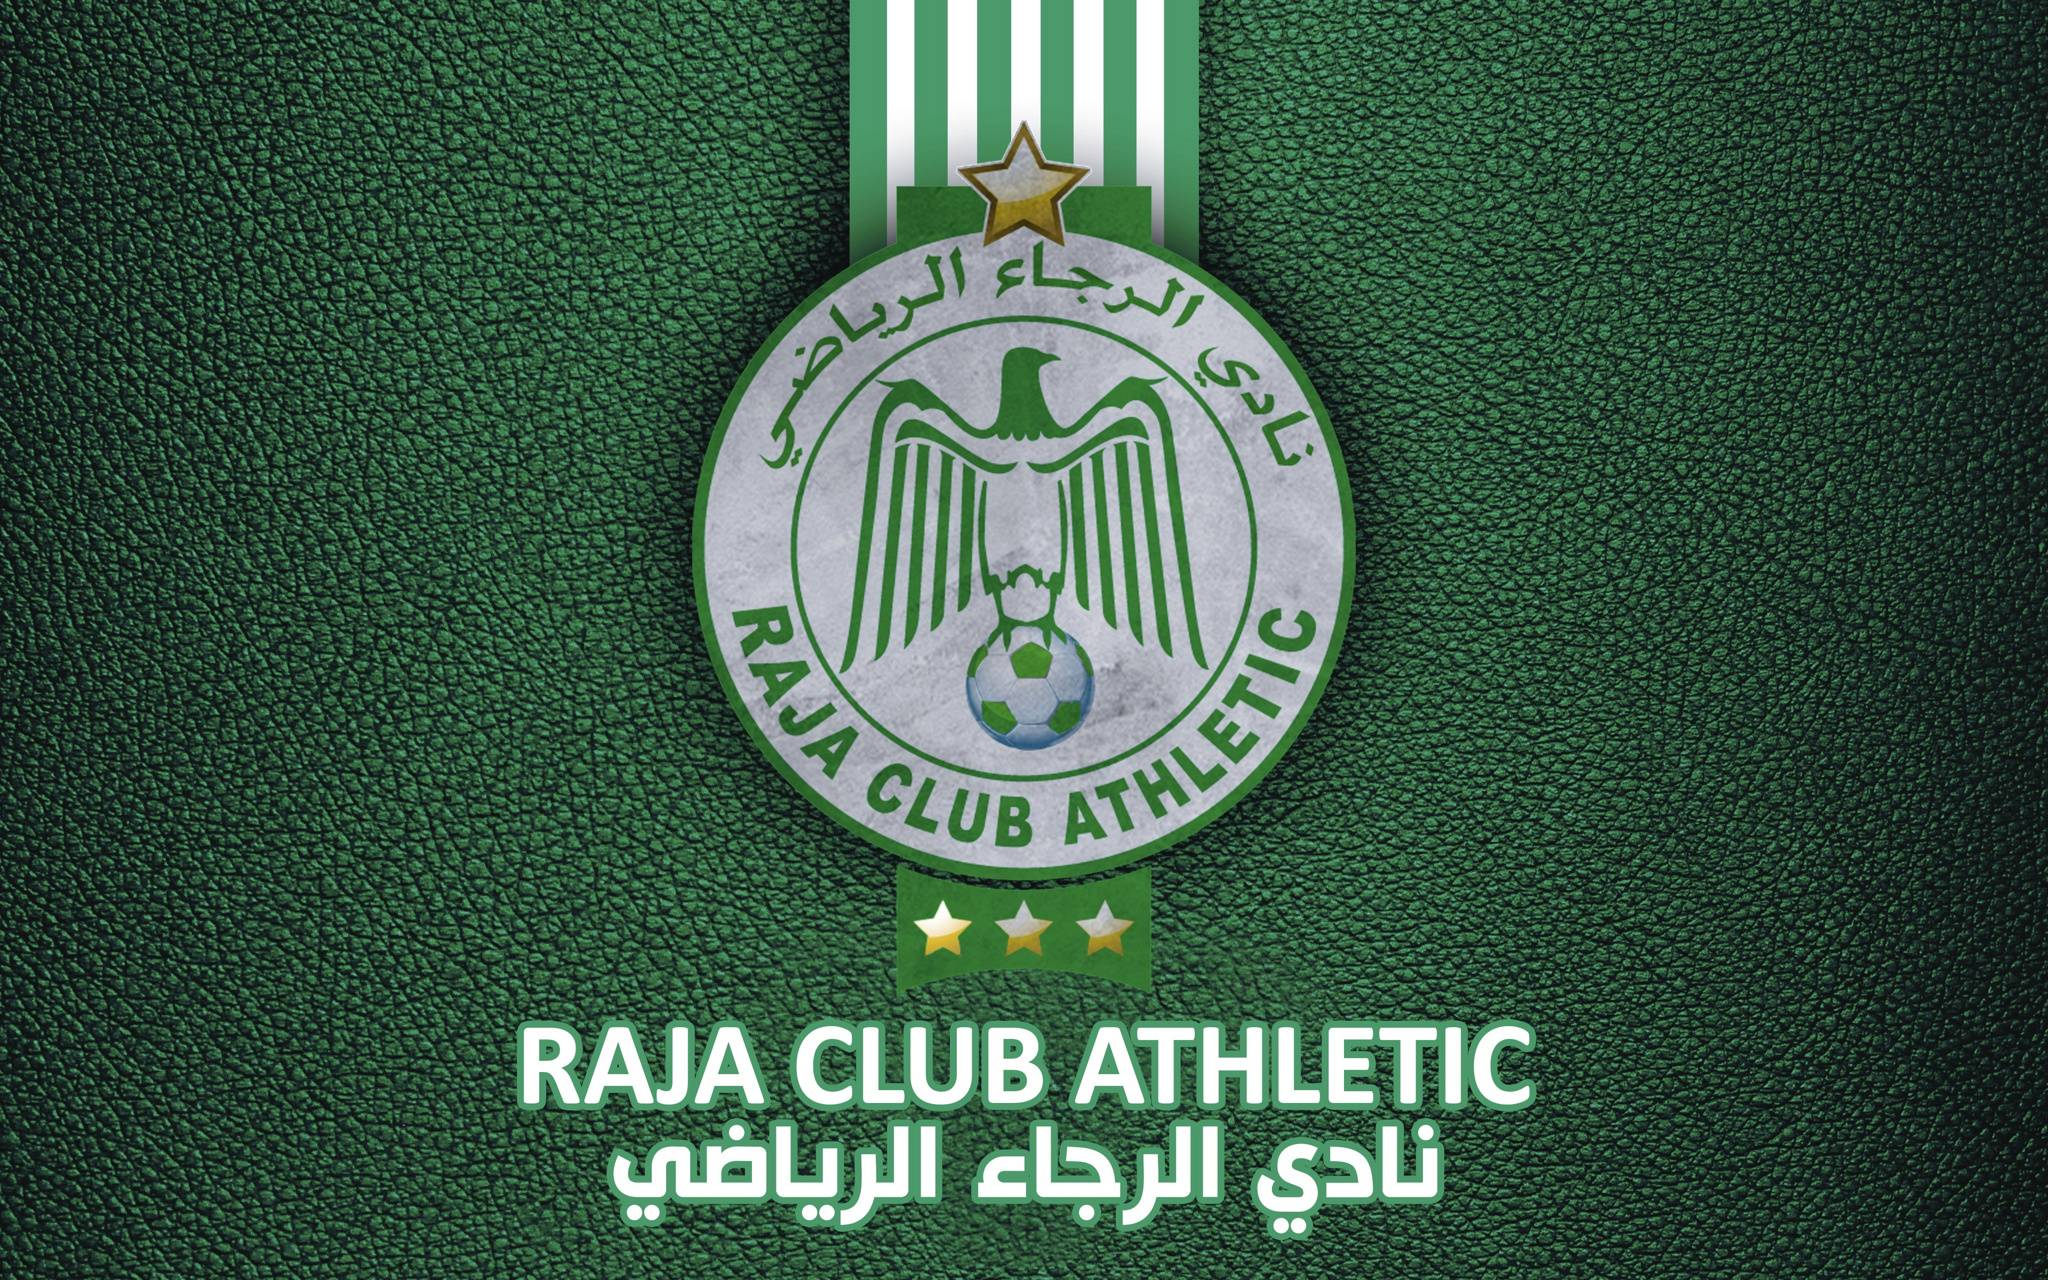 Raja Club Athletic Wallpapers Top Free Raja Club Athletic